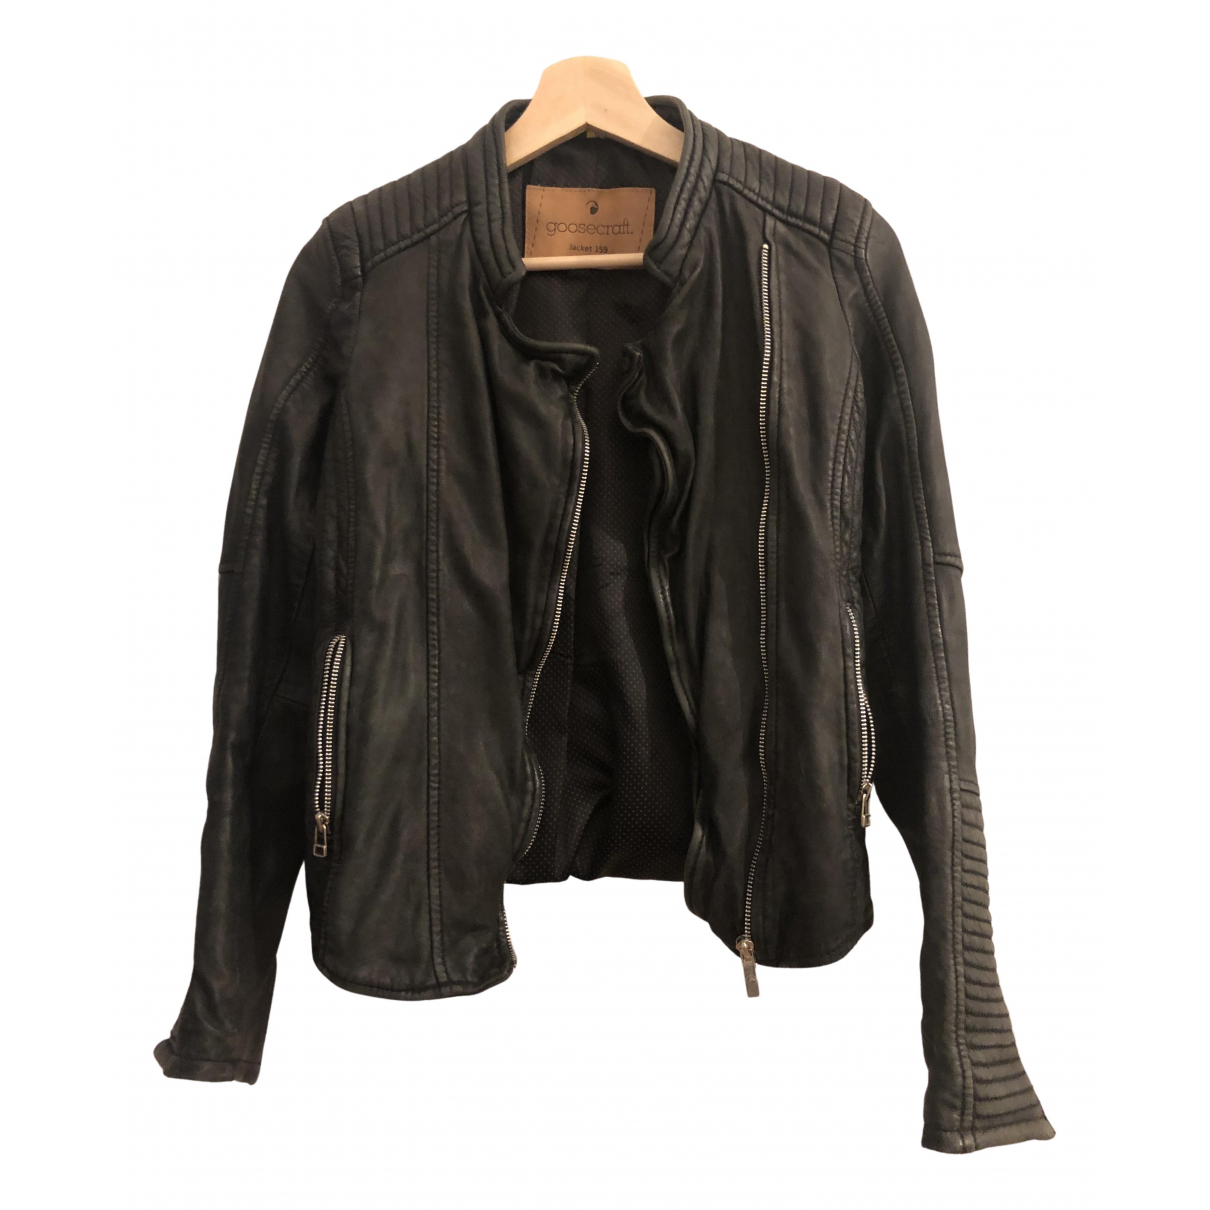 Goosecraft \N Black Leather Leather jacket for Women 36 IT